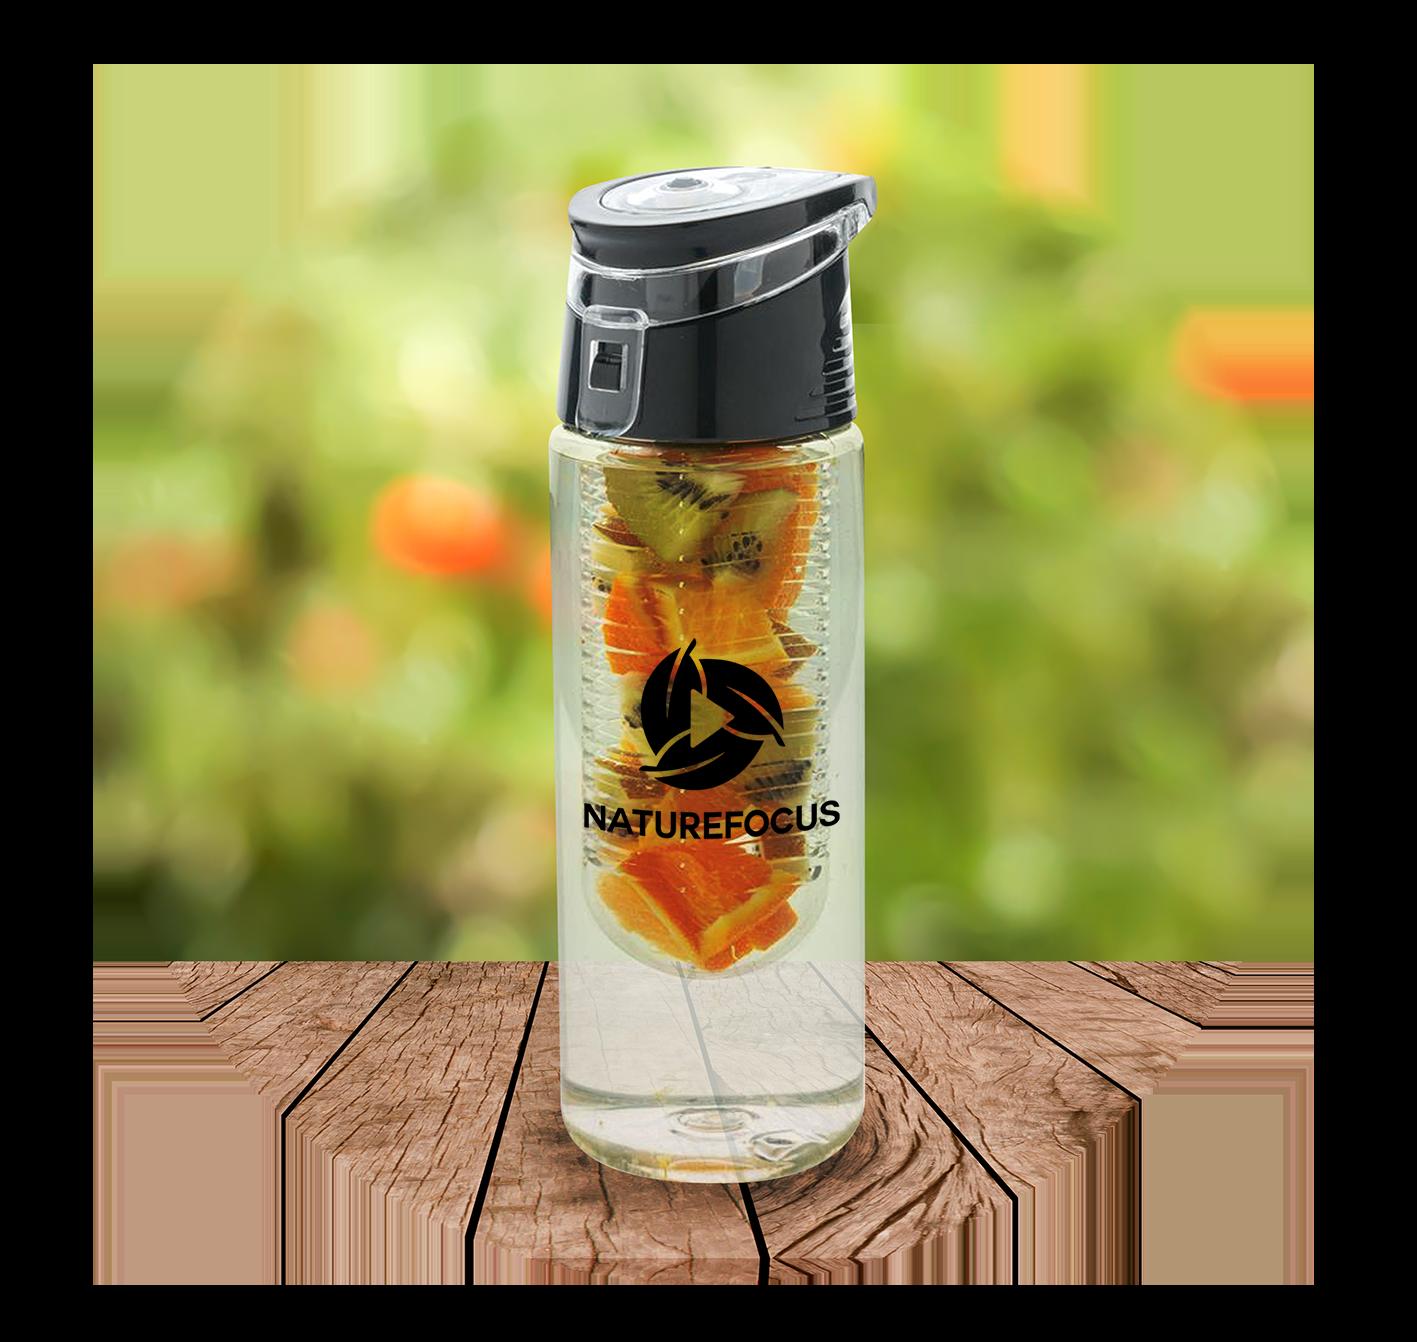 Promotional healthy bottle